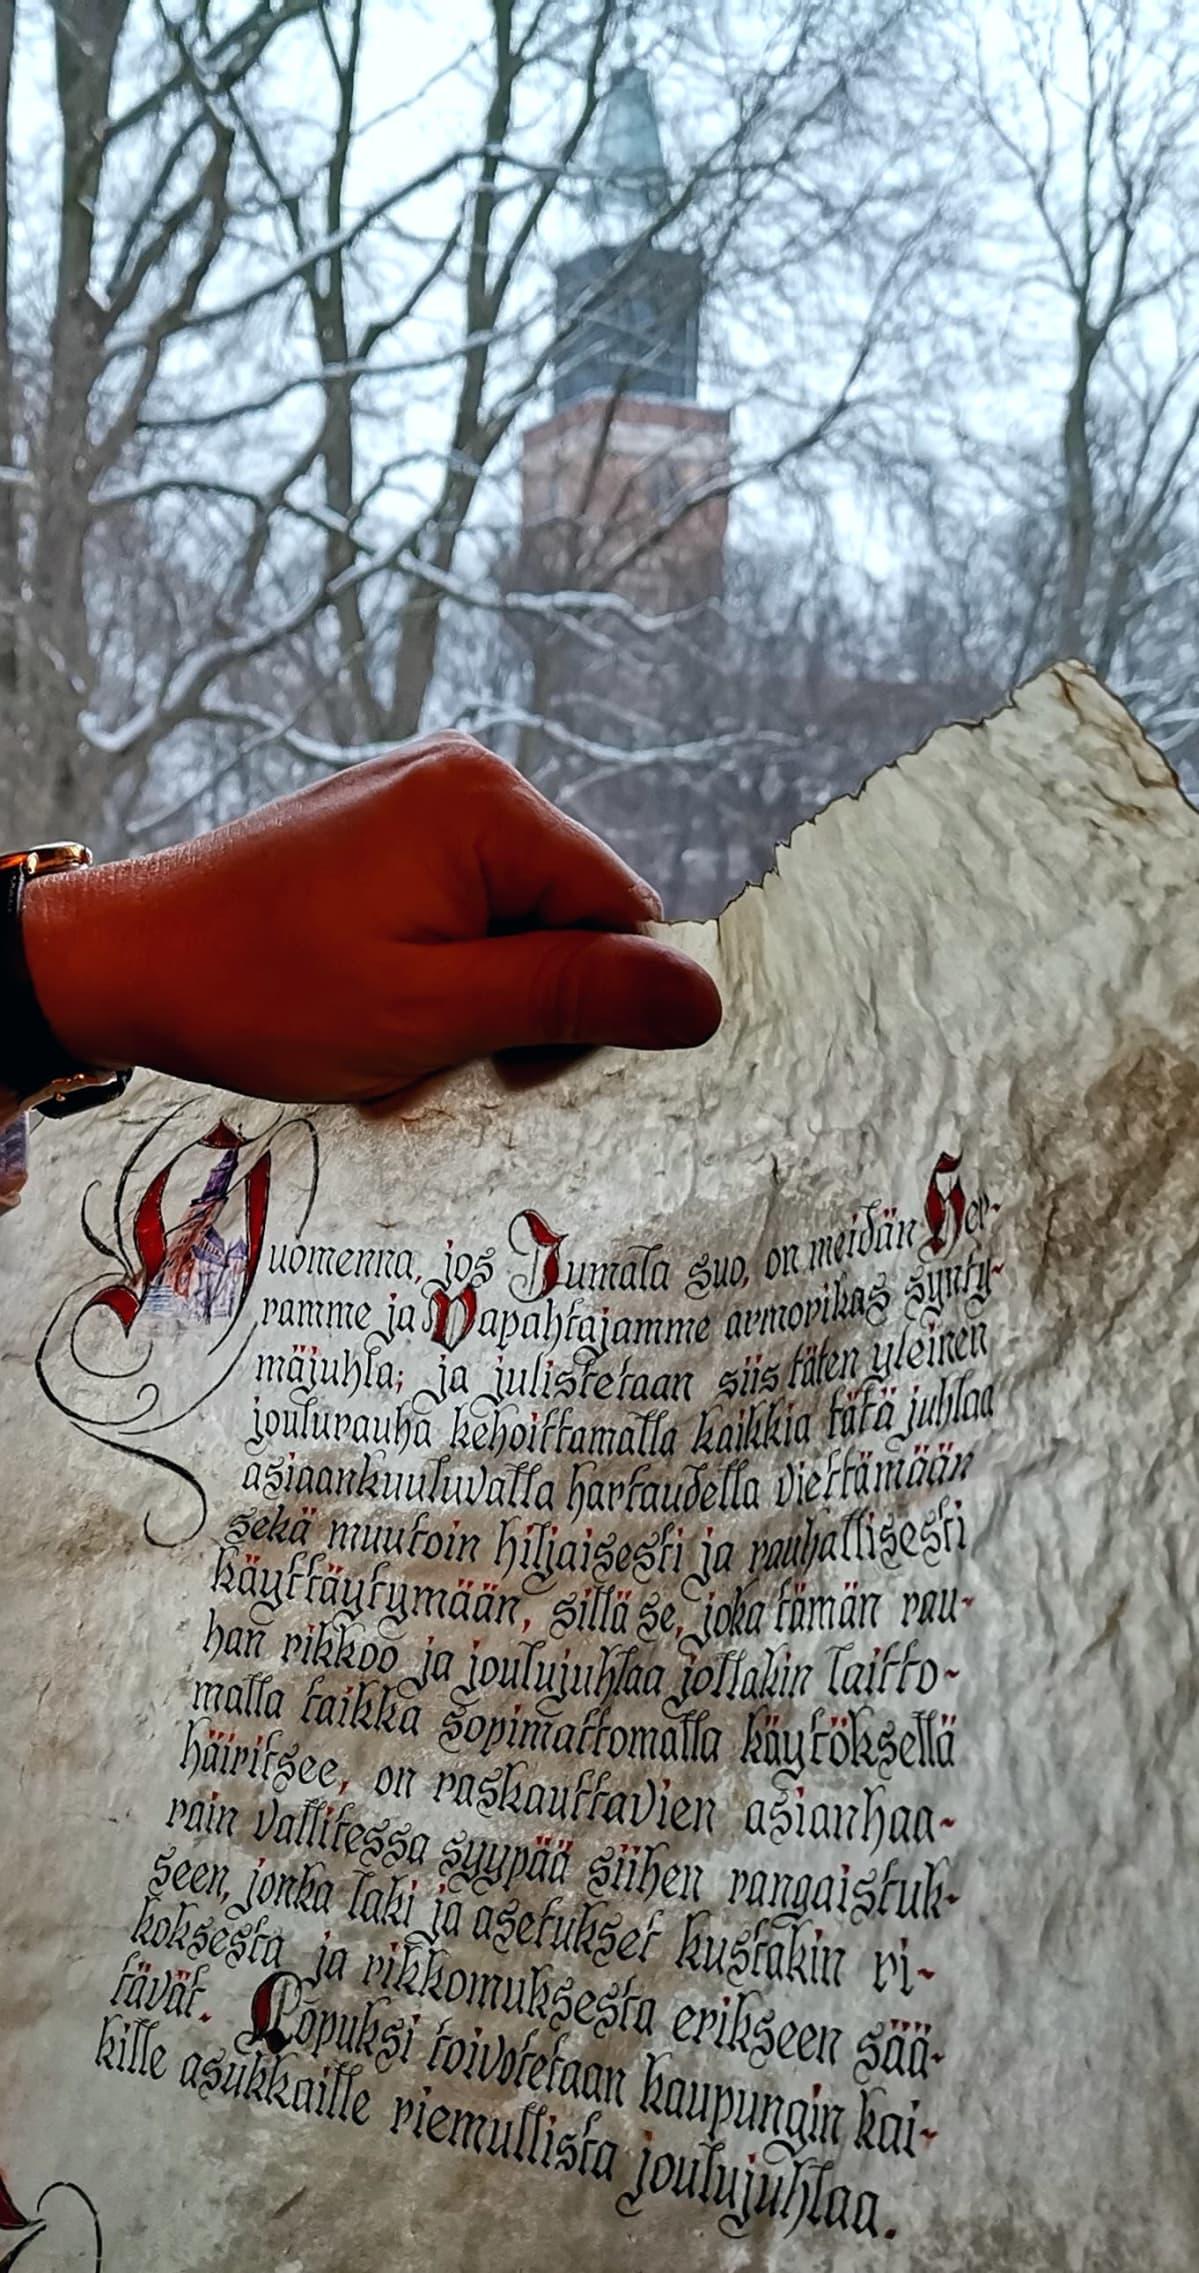 Joulurauhan julistuspergamentti.